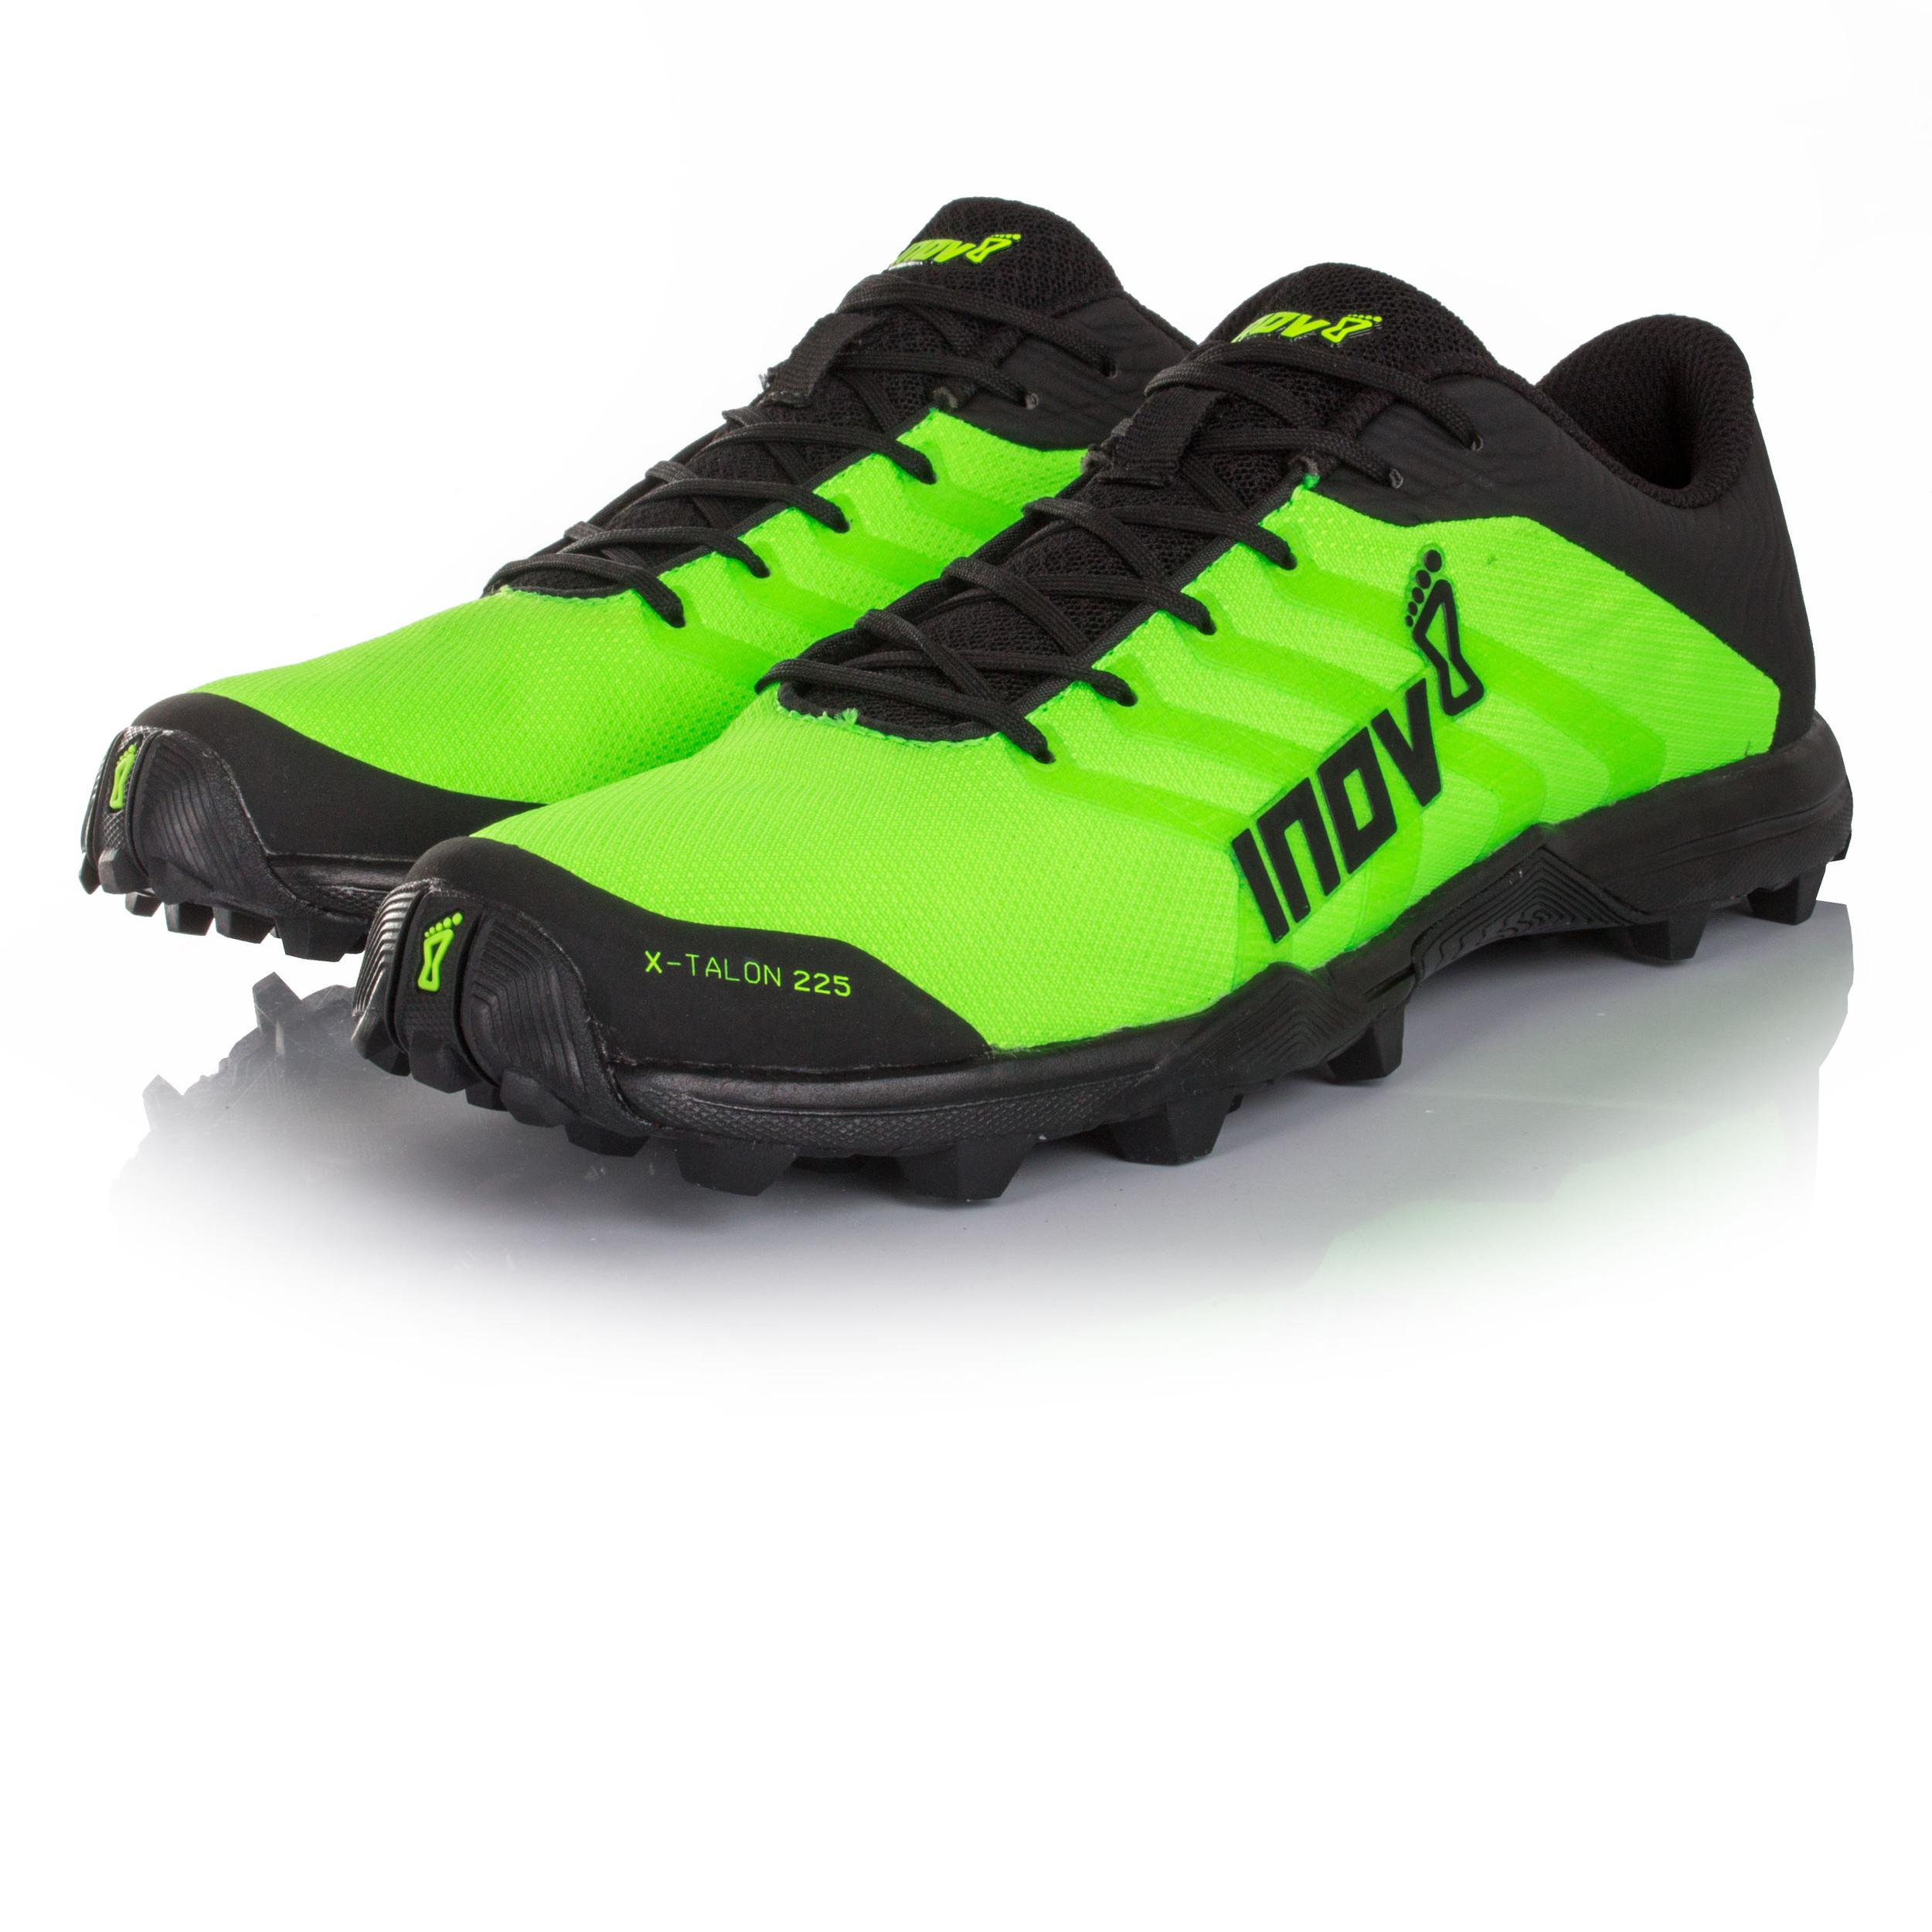 d345e7fd73ea3 Inov8 Unisex Verde X-Talon 225 Sendero Correr Deporte Zapatos Zapatillas